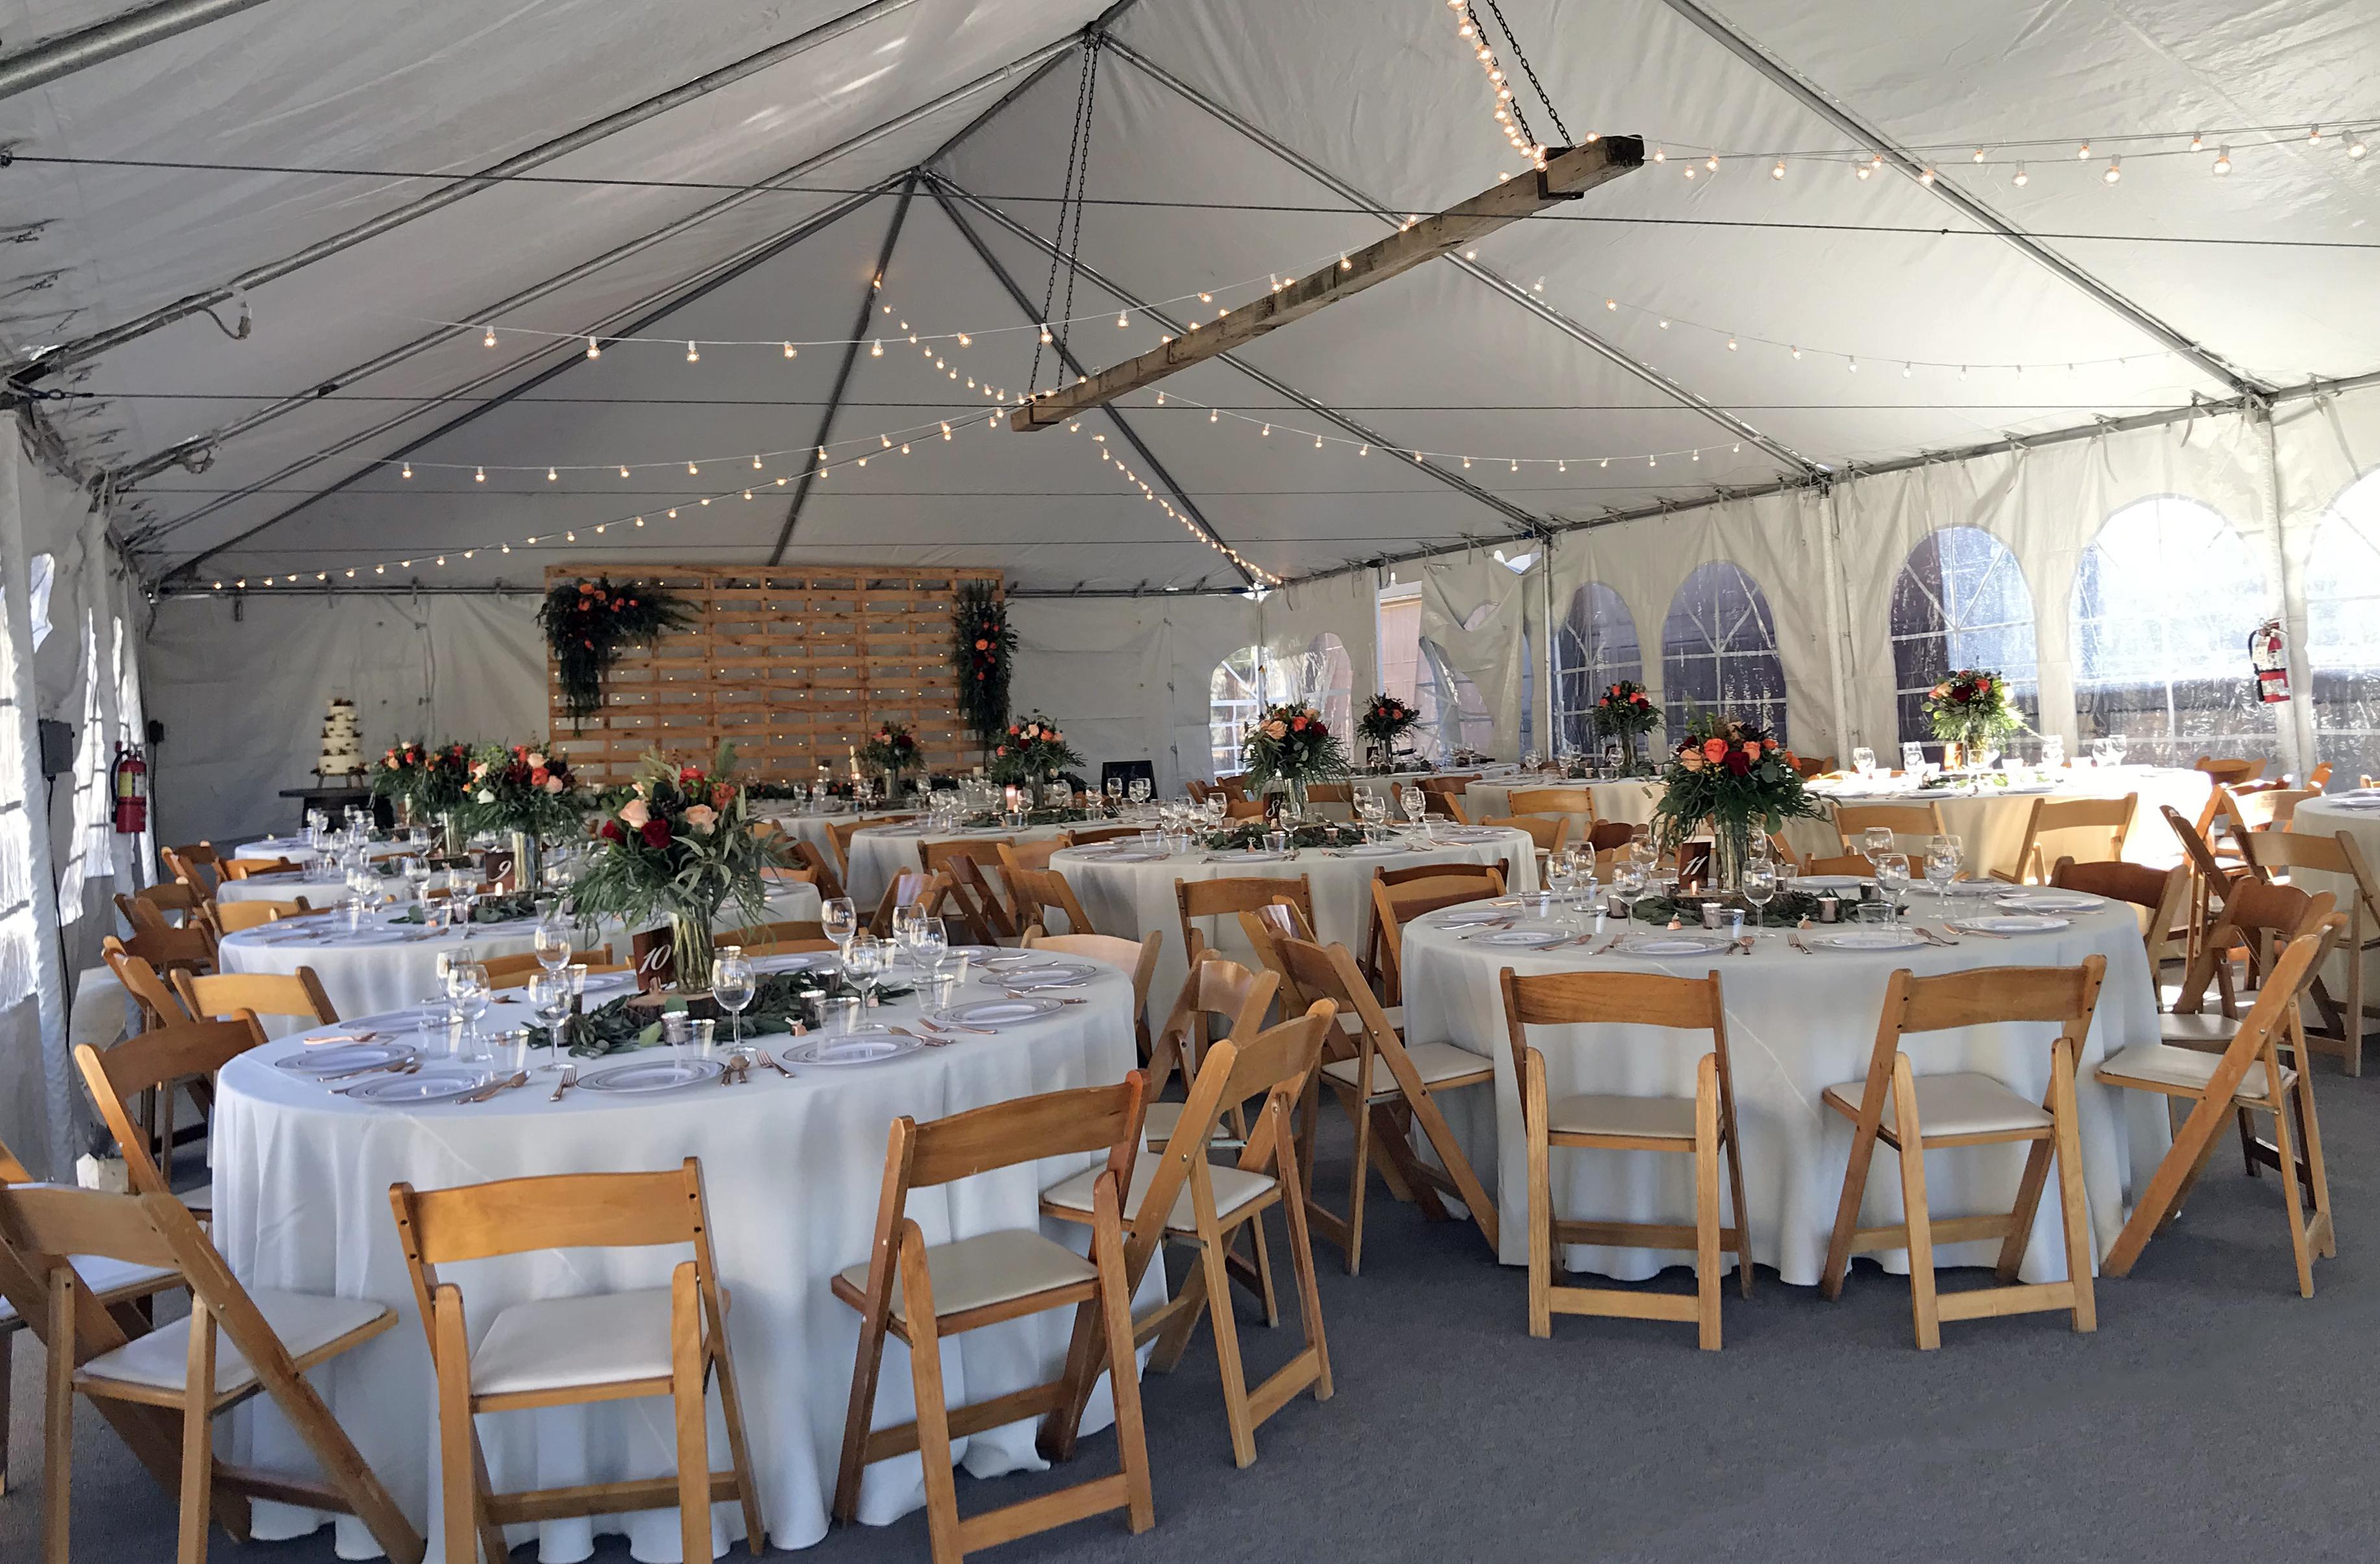 30' x 60' Frame Tent